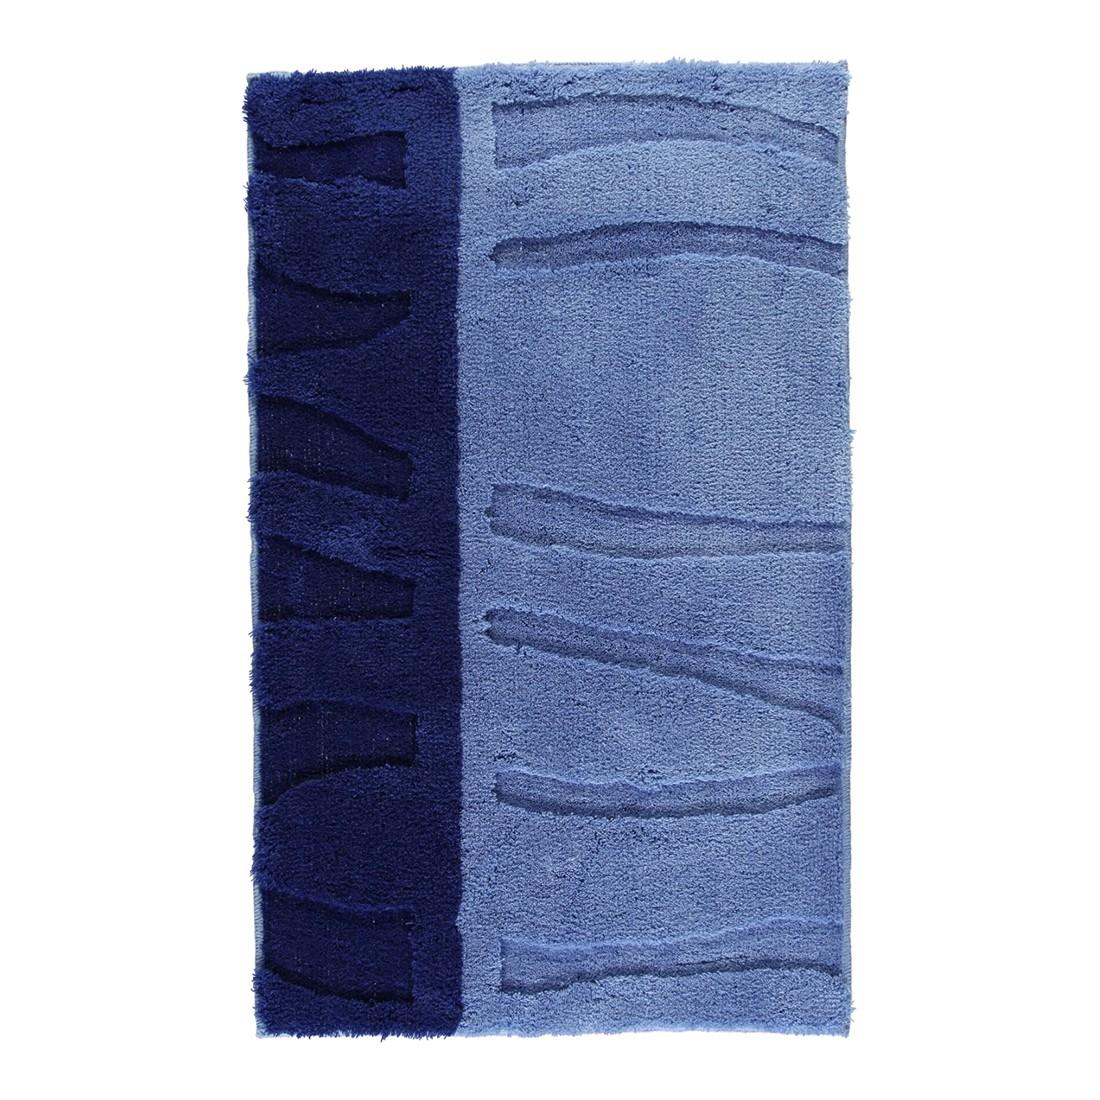 Badteppich Arcadia – 100% Polyacryl Blau – 720 – 55×65 cm, Kleine Wolke kaufen